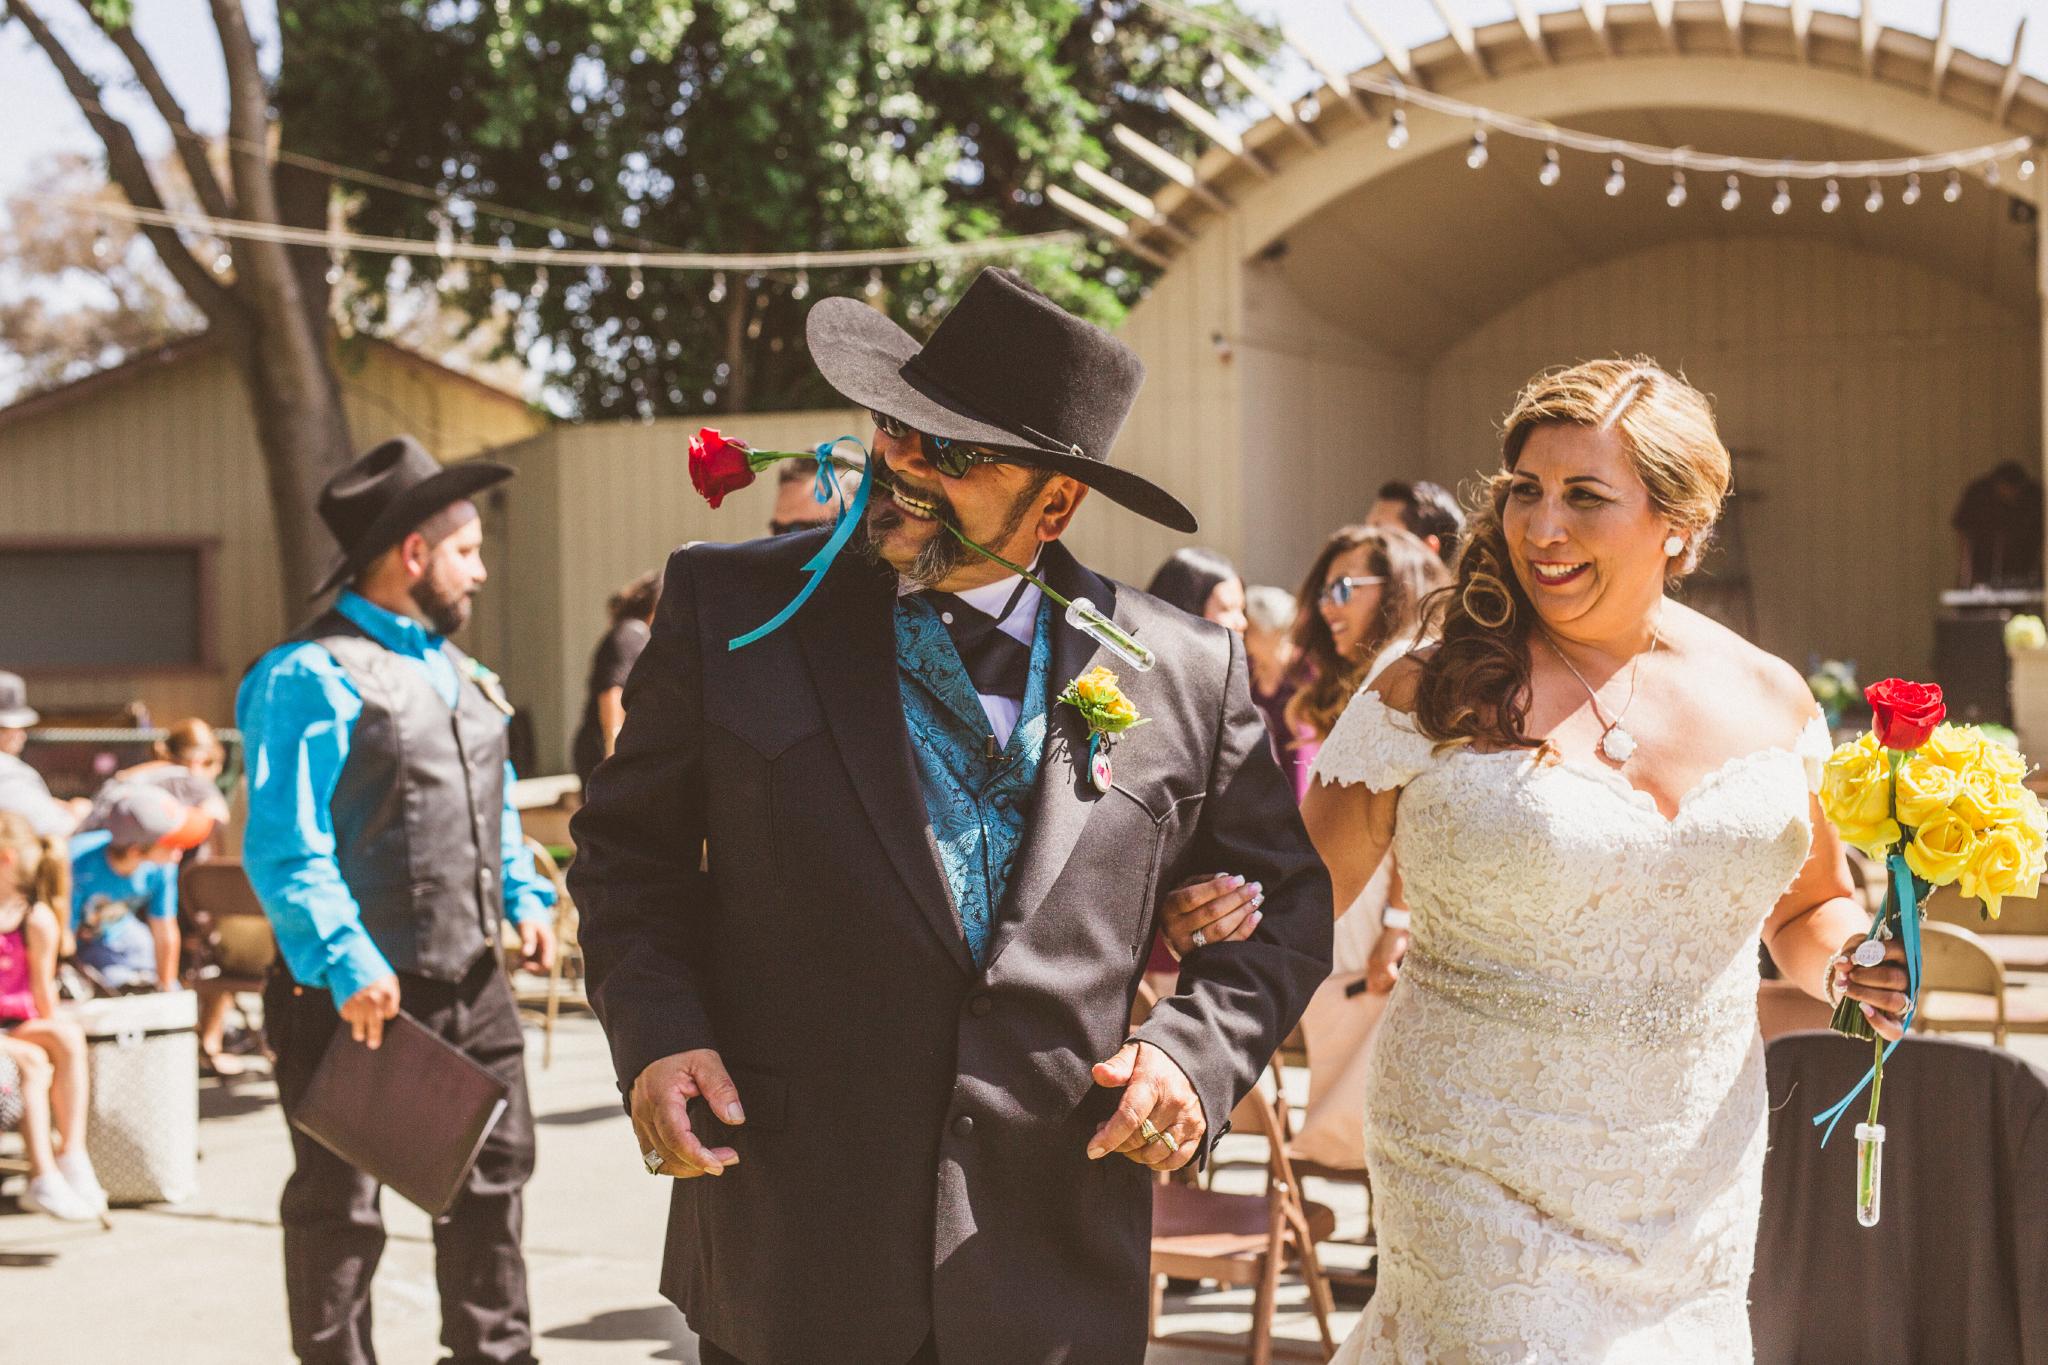 san diego wedding   photographer   groom with rose between teeth with bride